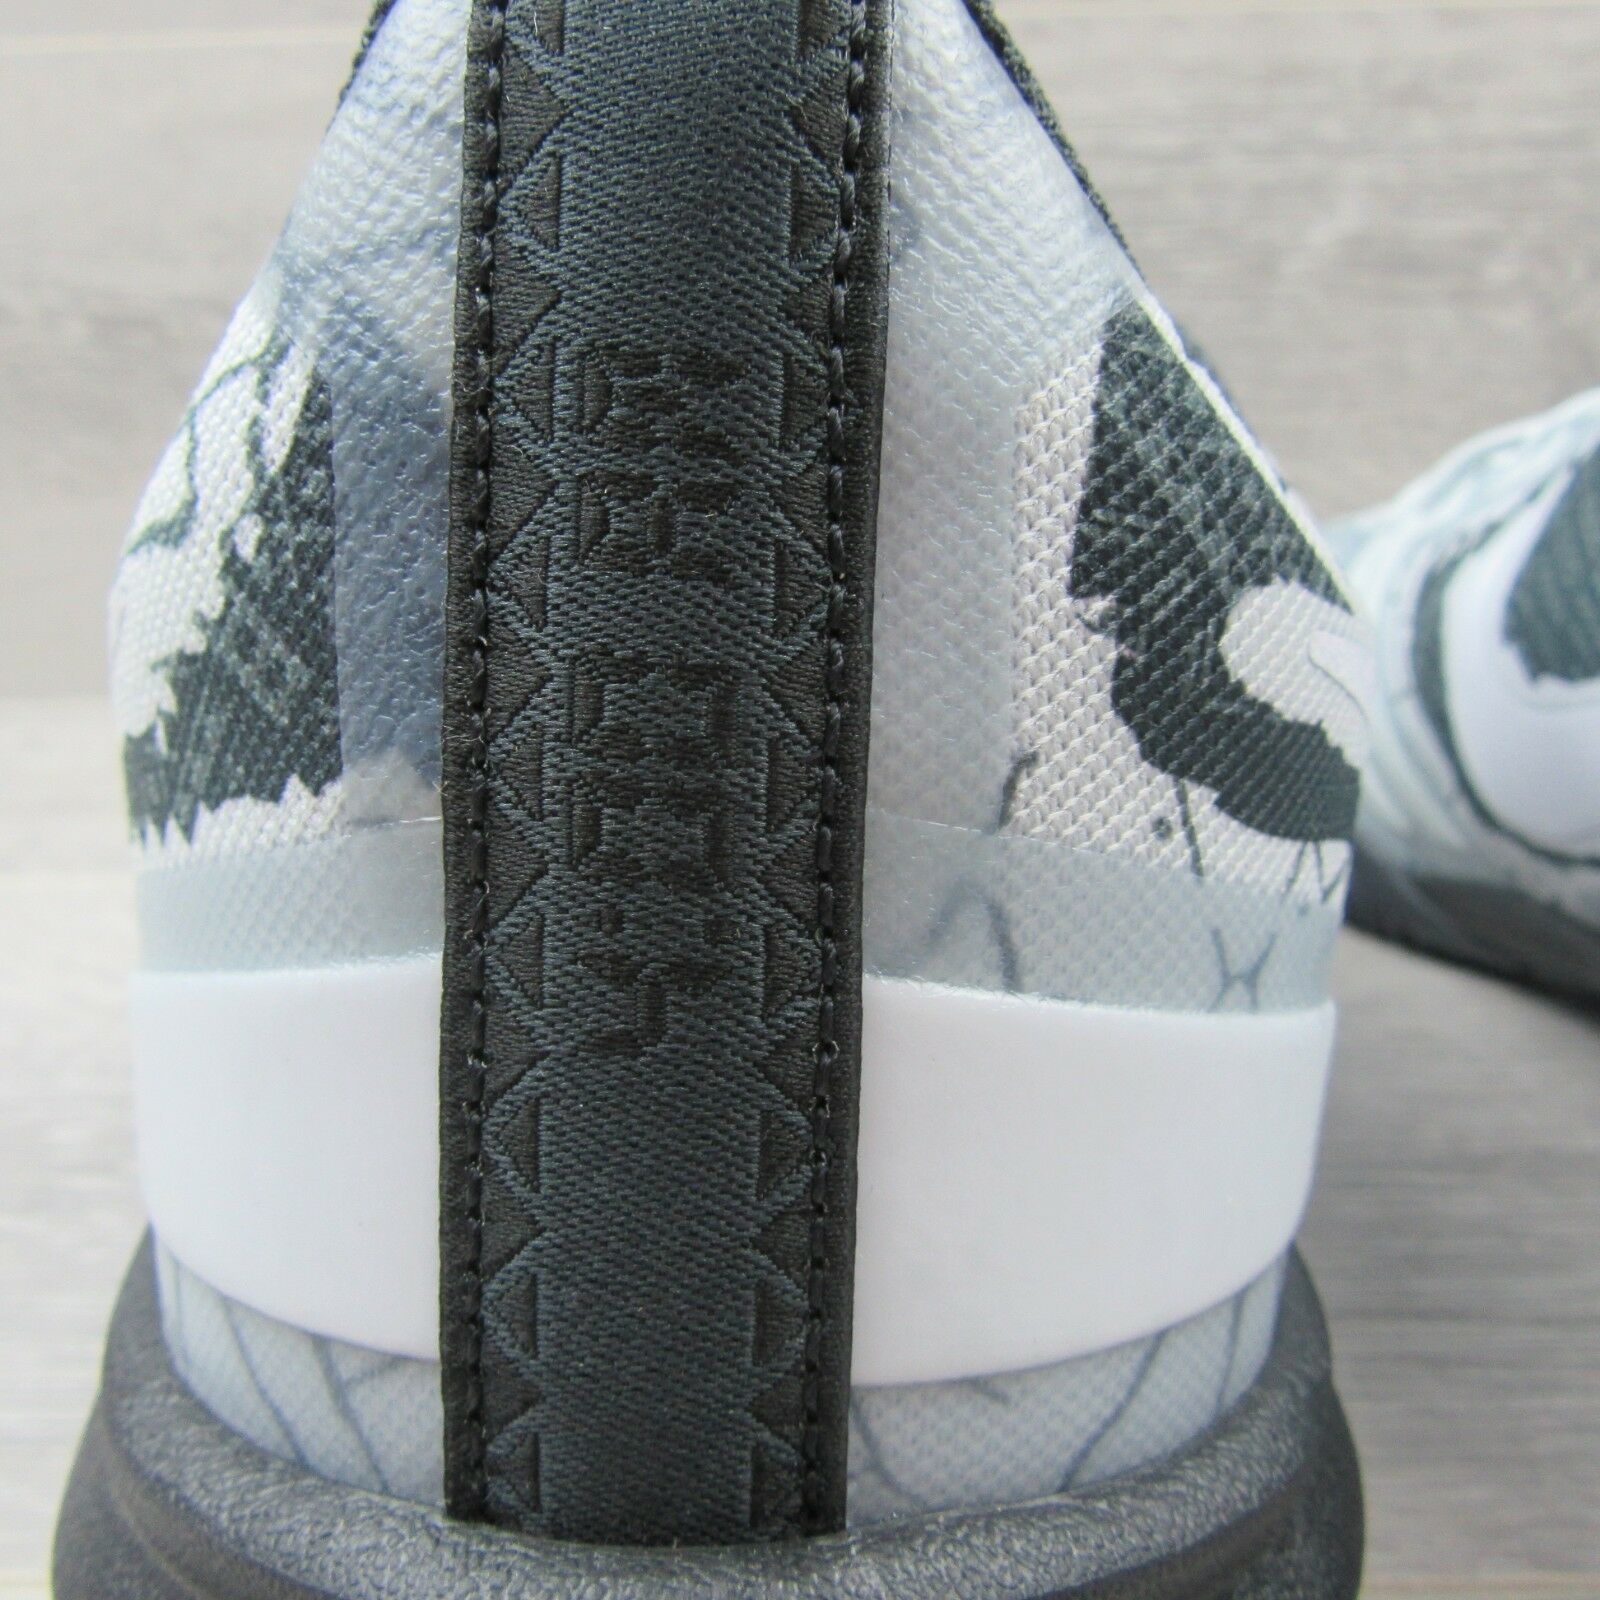 Nike Kobe Mentality Cracked Pavement Basketball Shoes Size 13 Grey 704942 003